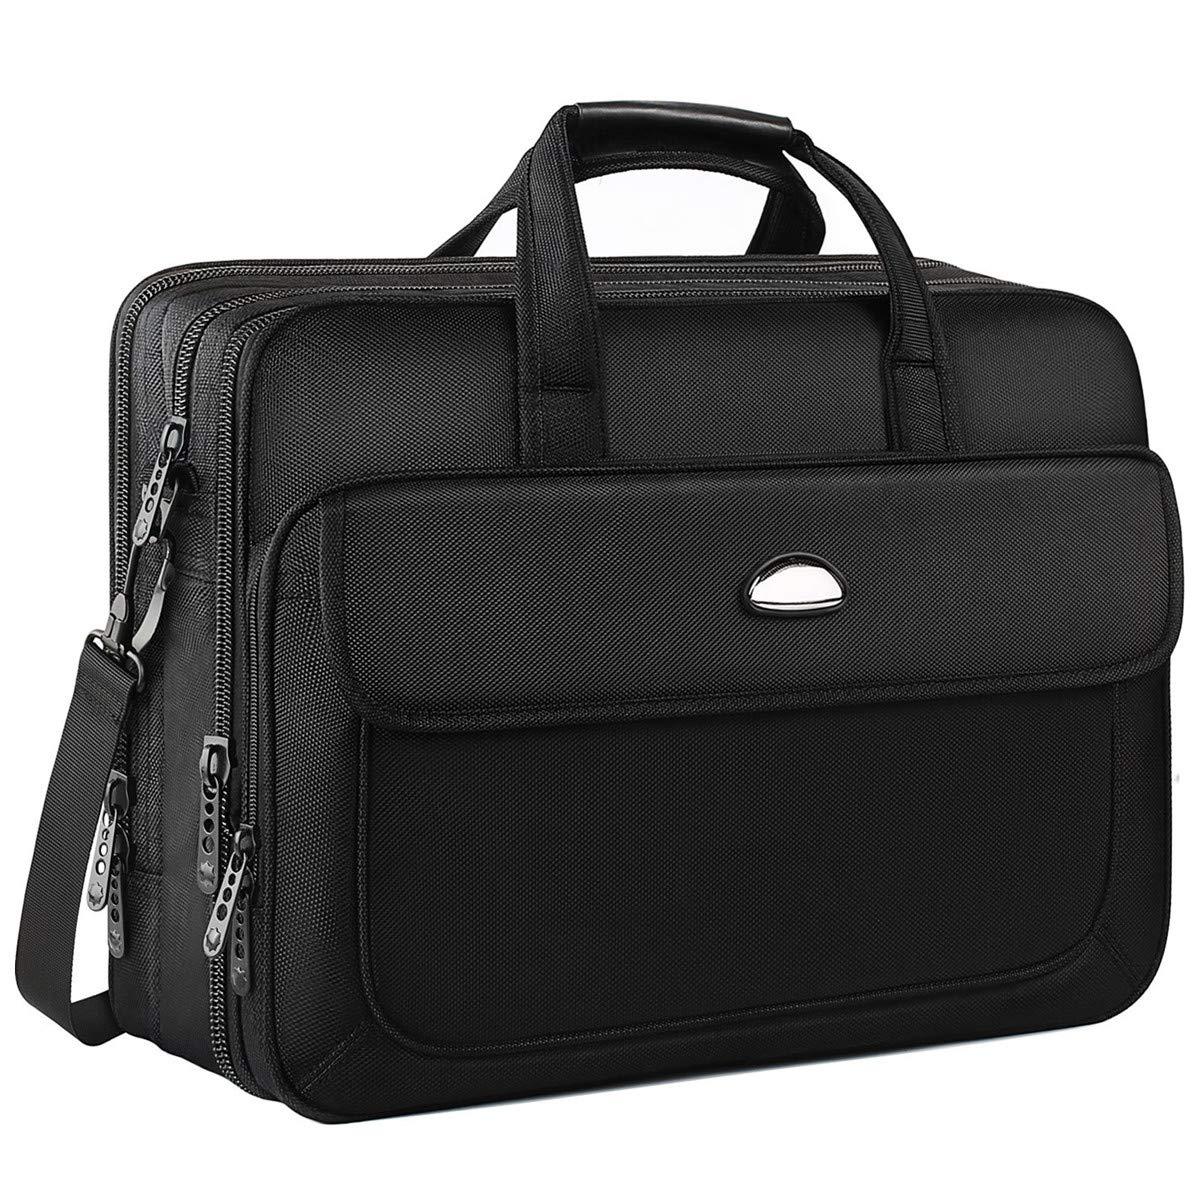 17 inch Laptop Bag, Expandable Large Briefcase, Messenger Bags for Men, Crossbody Shoulder Bag Fit up to 17 inch Laptop Notebook MacBook Pro Air Ultrabook